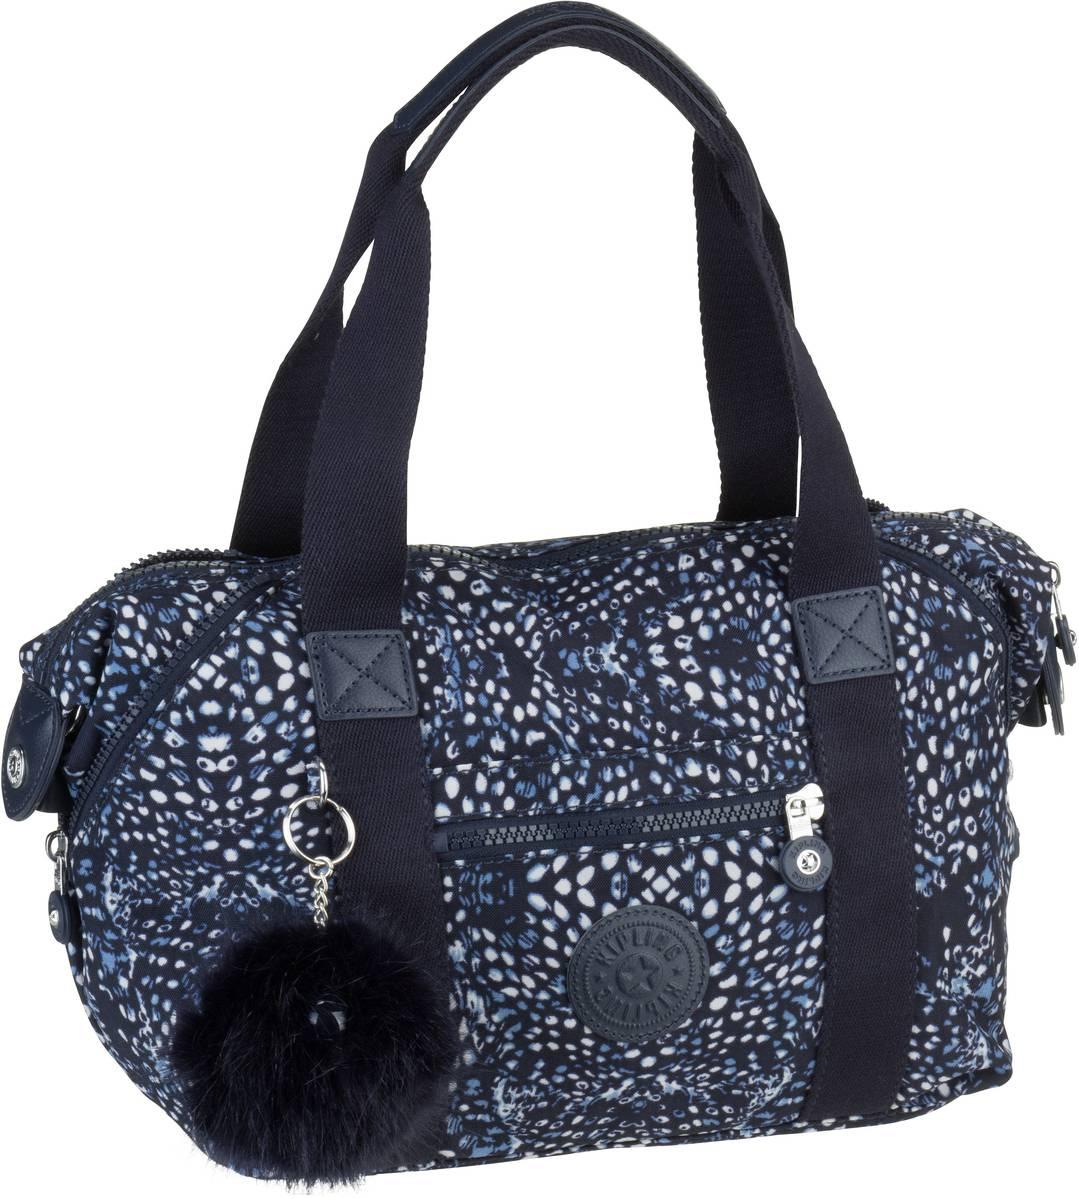 Handtasche Art Mini Basic Plus Soft Feather (innen: Grau) (13 Liter)